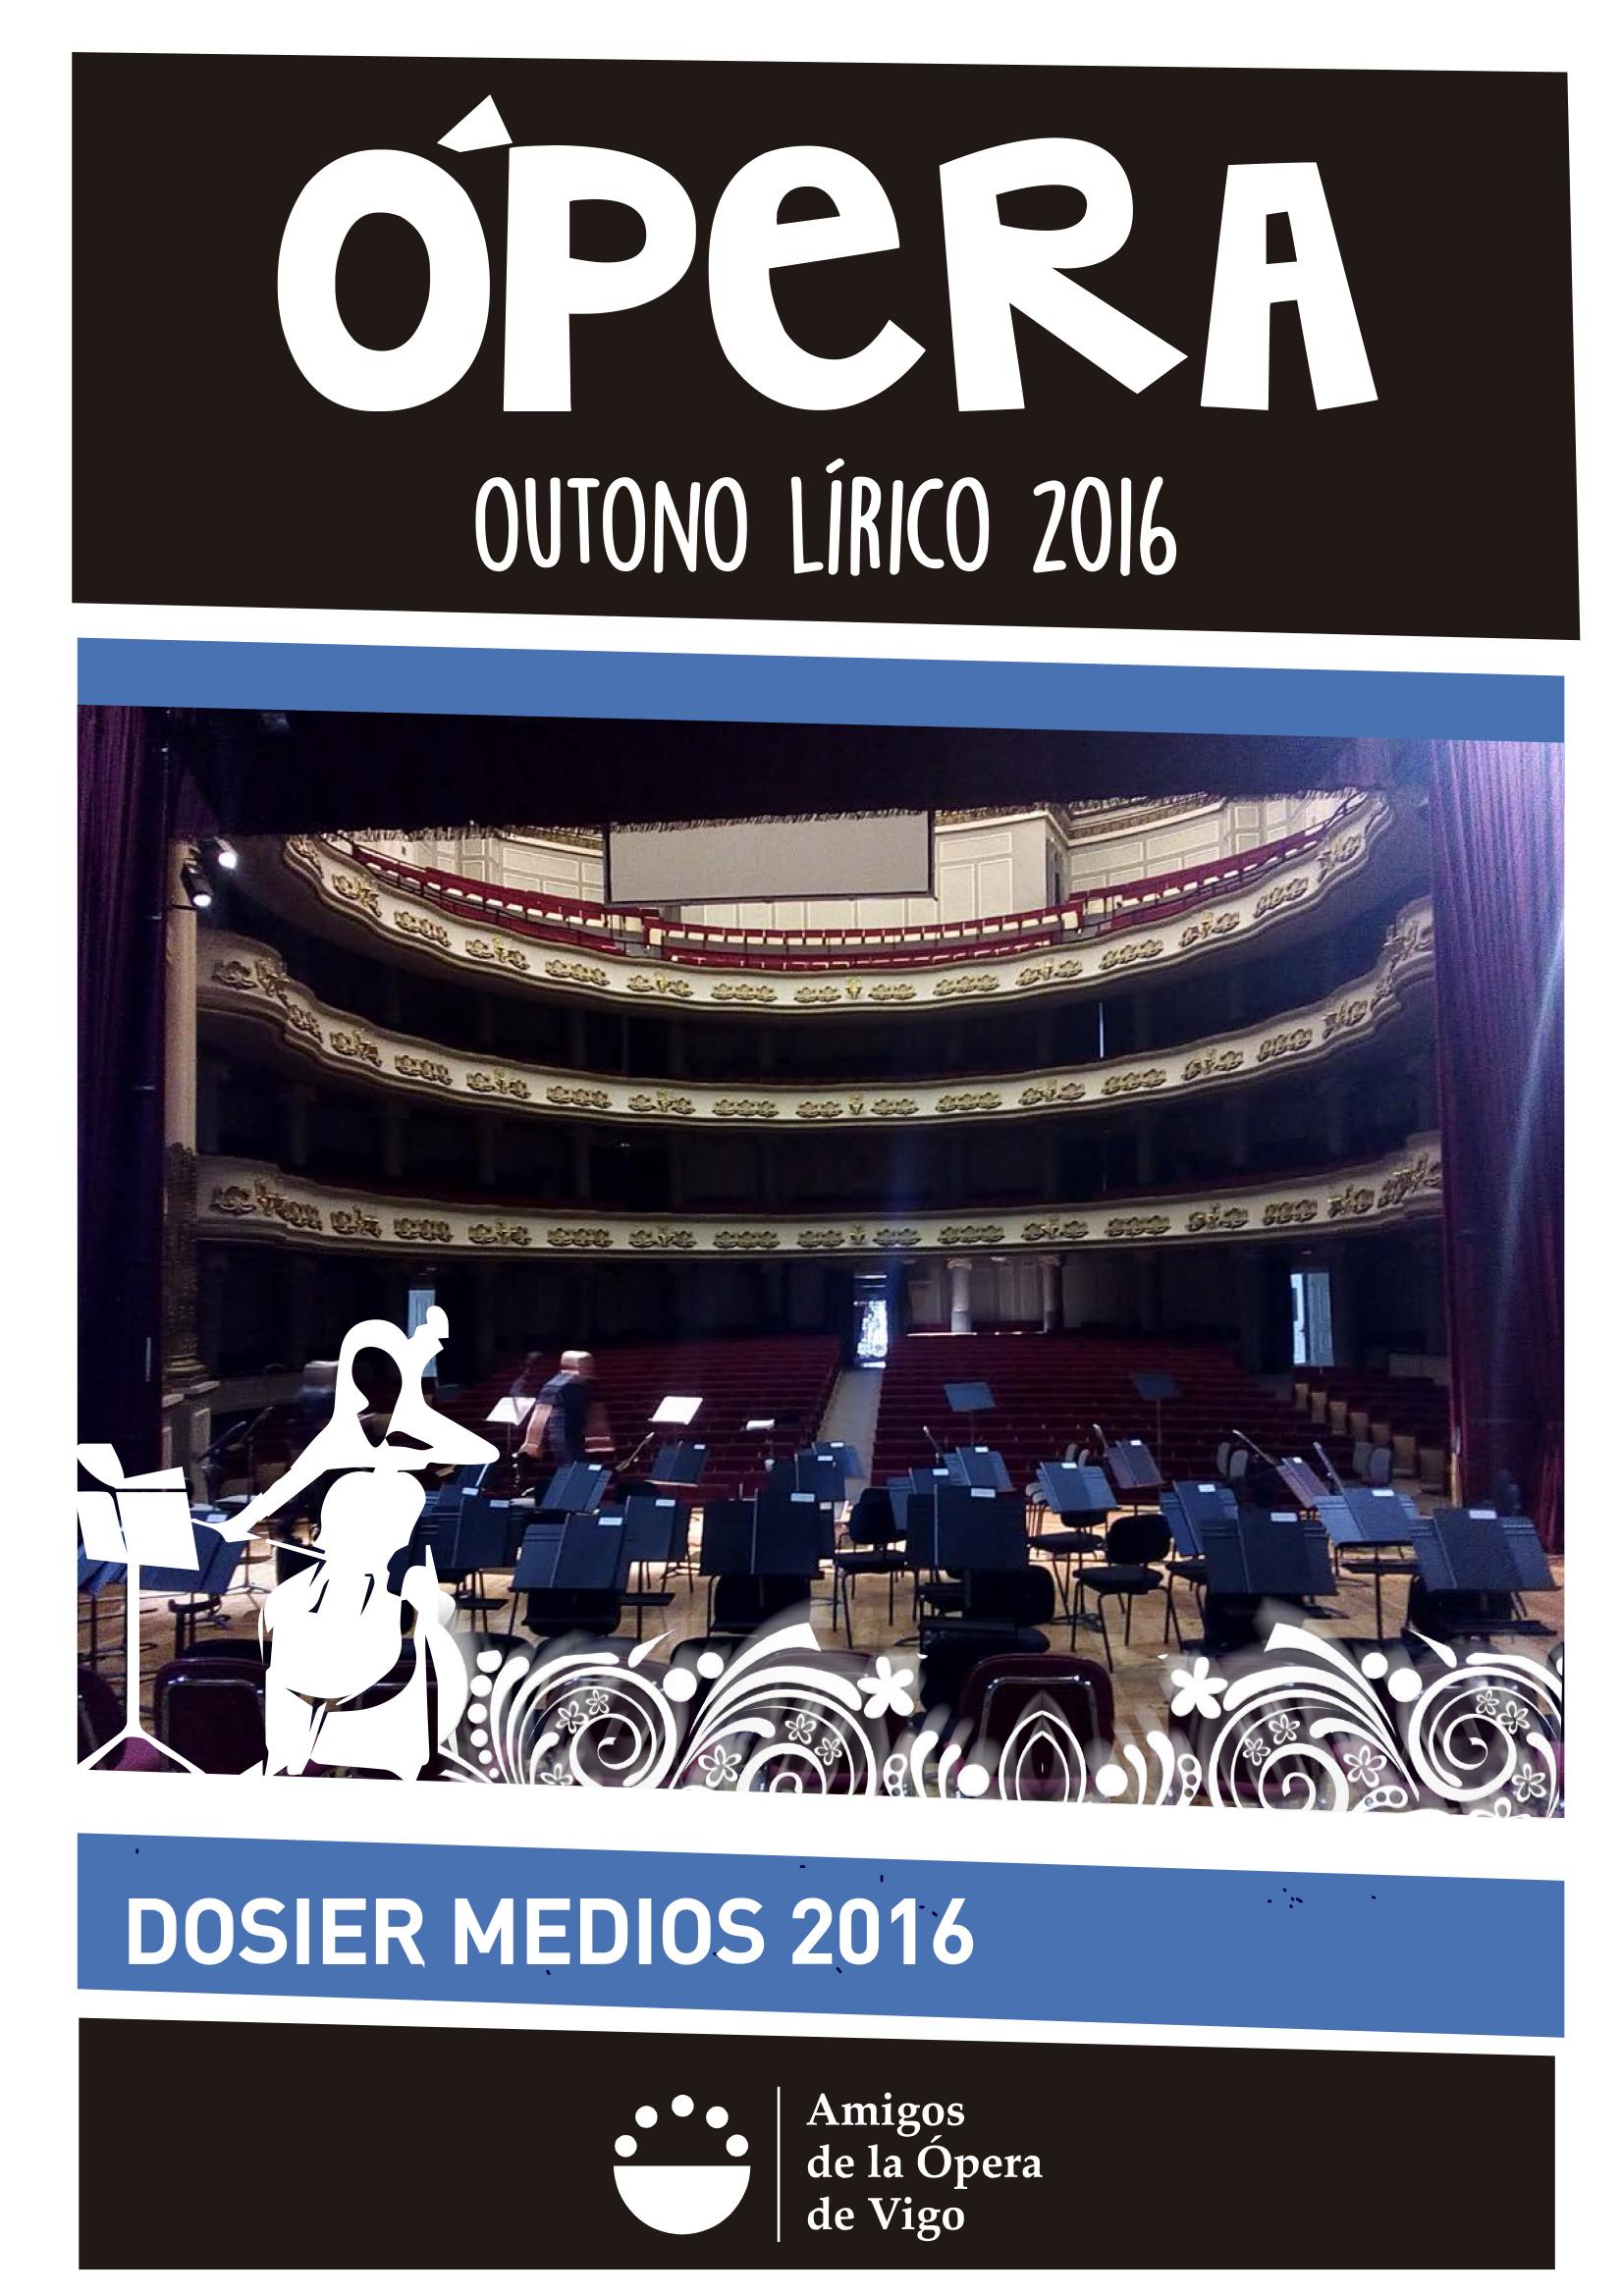 Dosier Actividades y Prensa temporada 2016